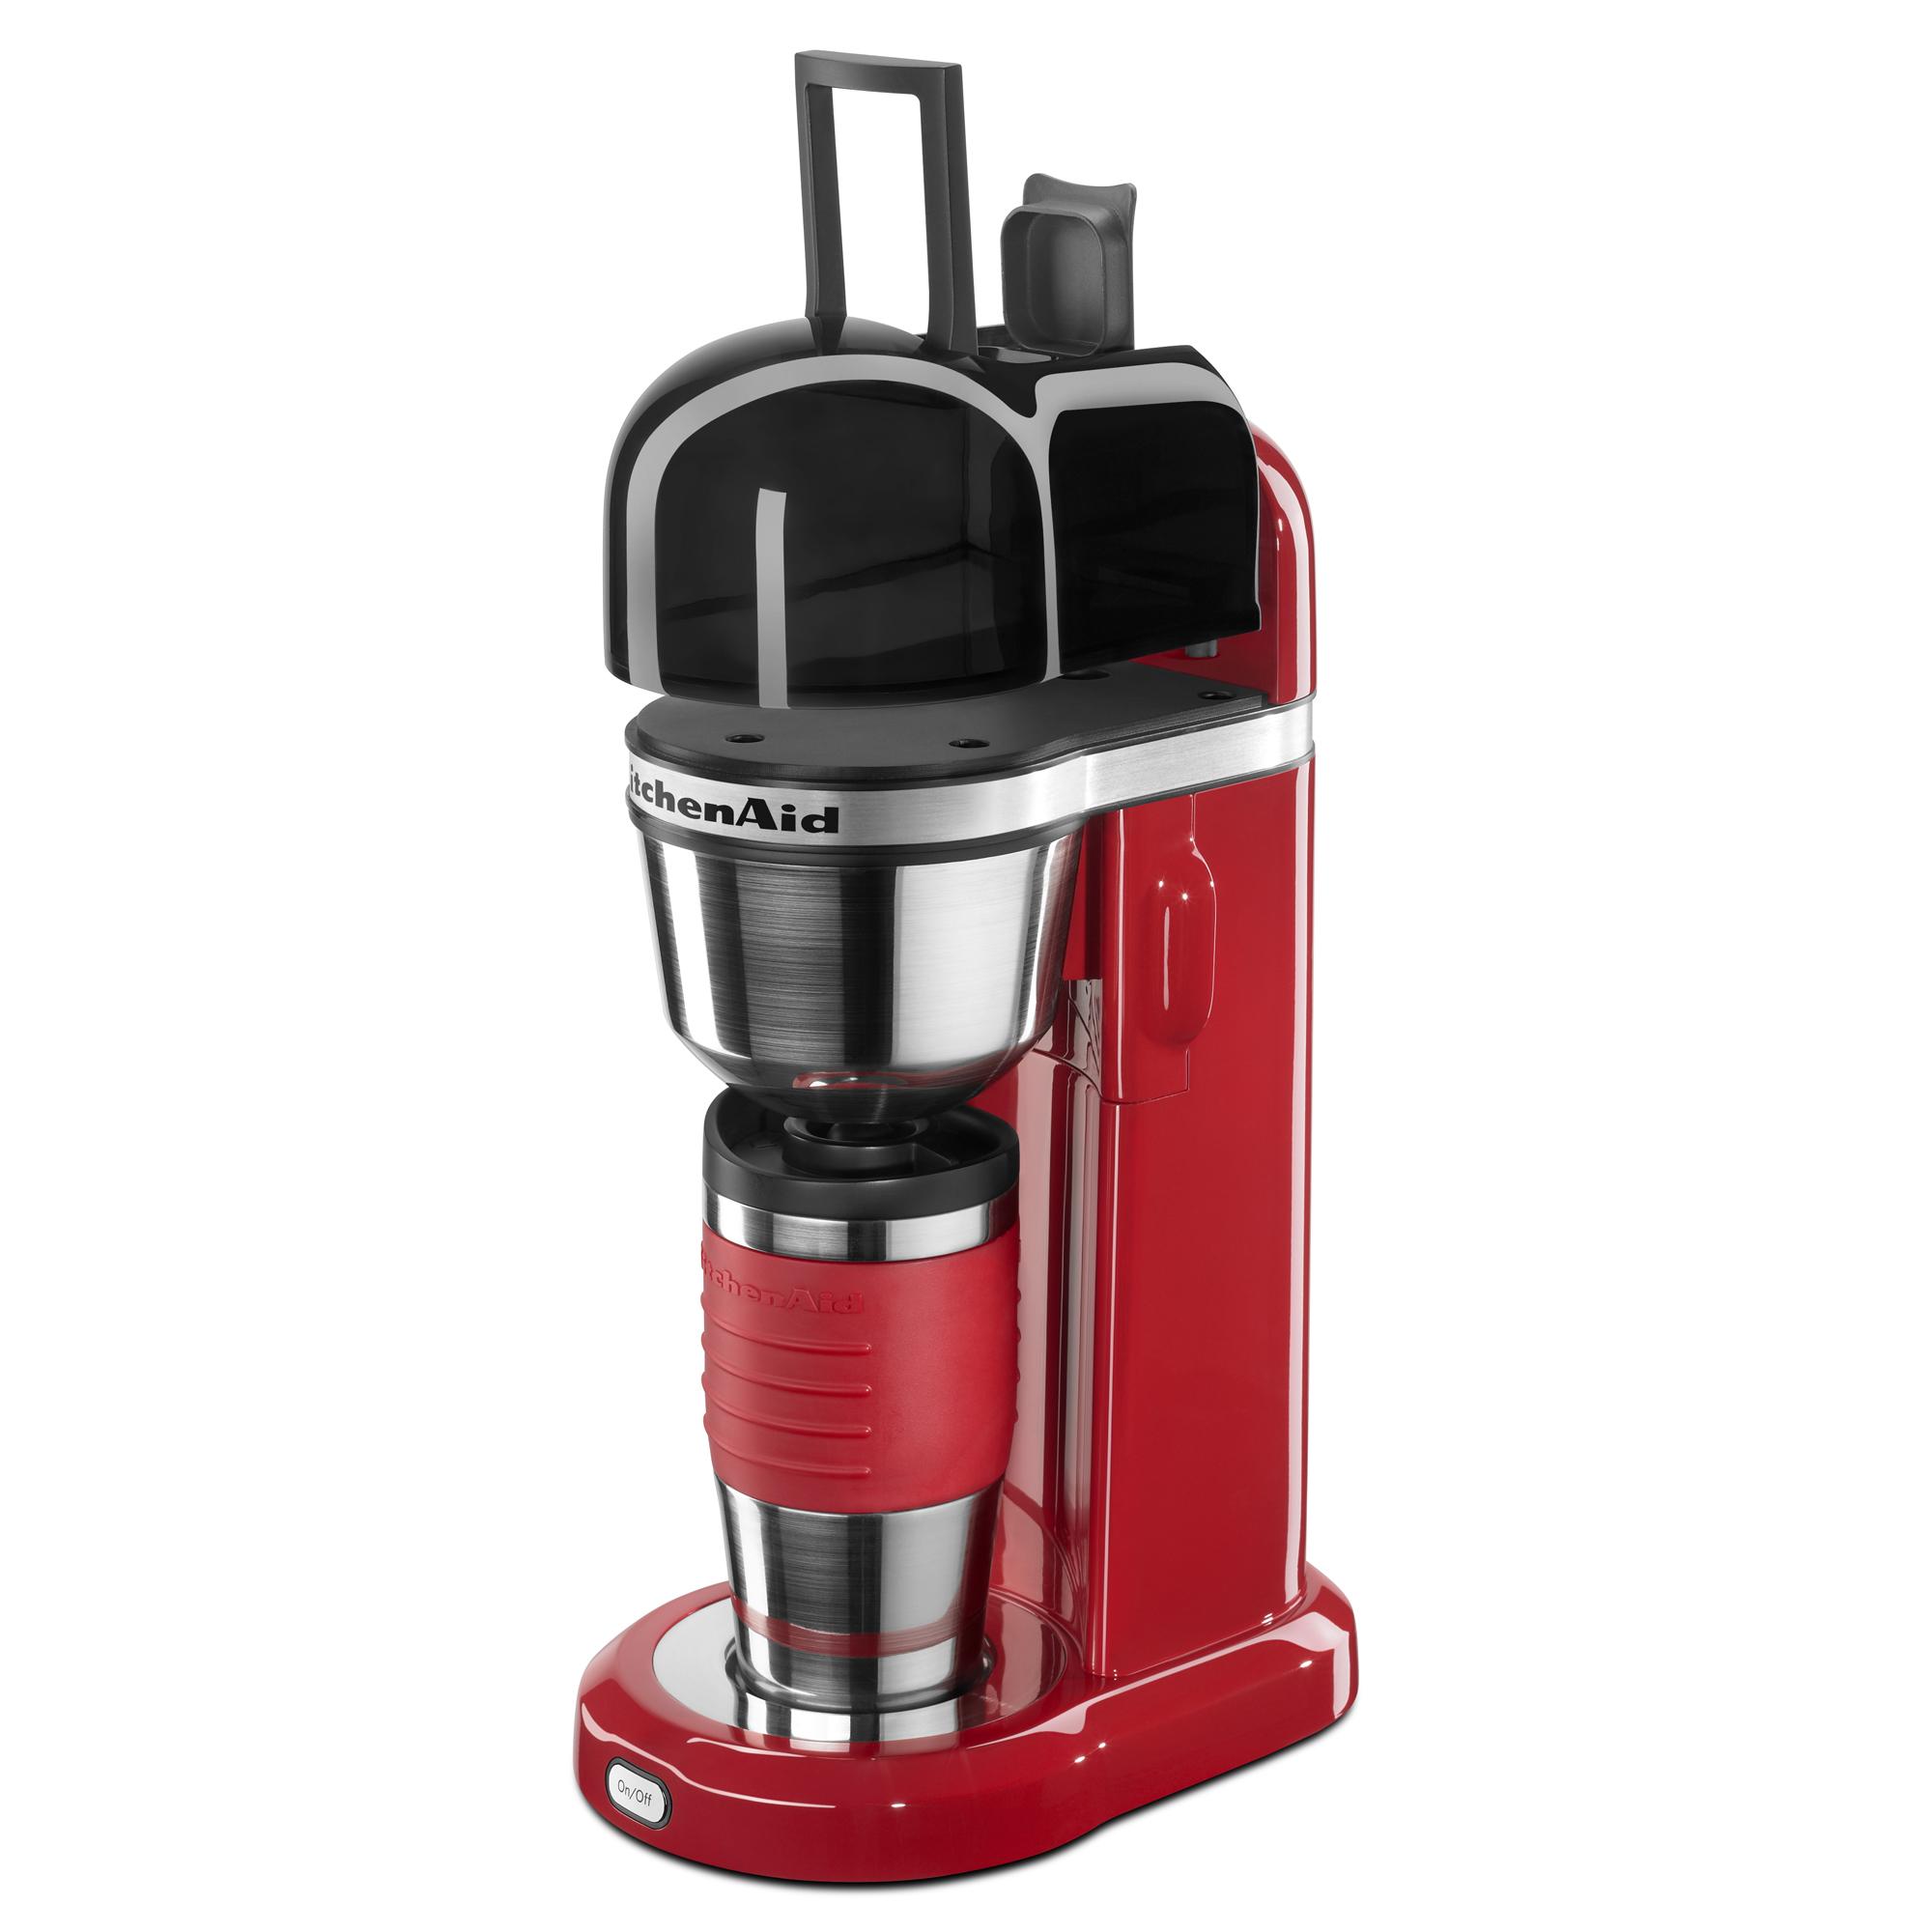 KitchenAid-Refurbished-Personal-Coffee-Maker-with-18-oz-Thermal-Mug-RKCM0402 thumbnail 8